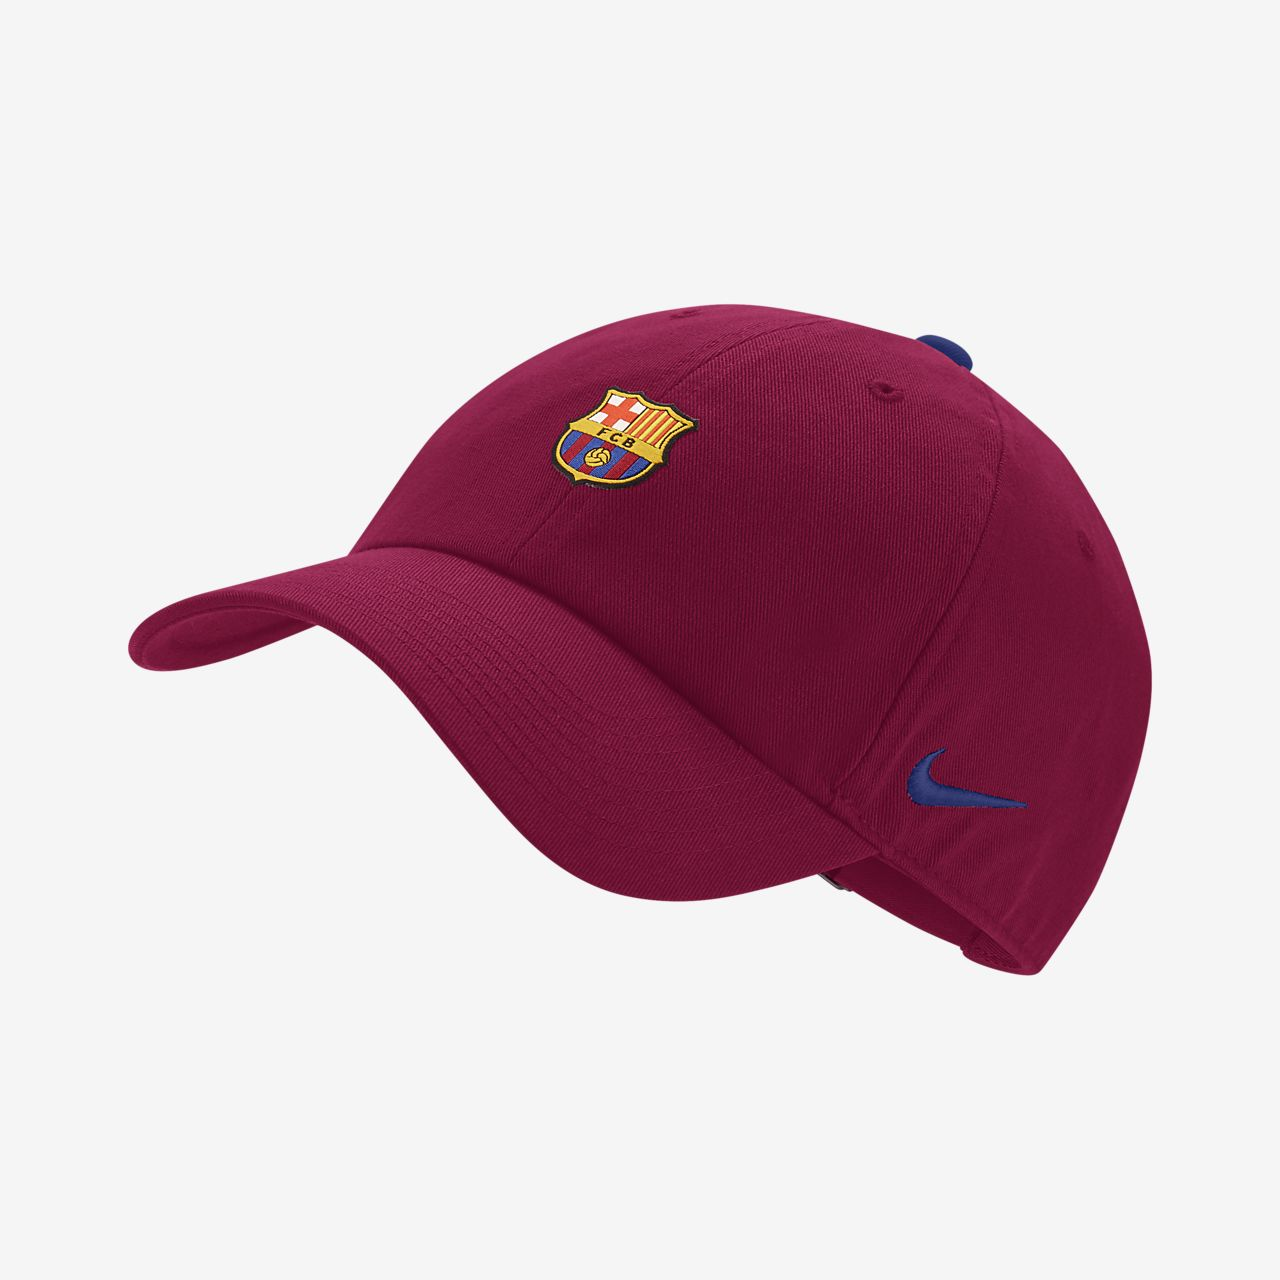 3d8323bdbf29f FC Barcelona Heritage 86 Adjustable Hat. Nike.com AU